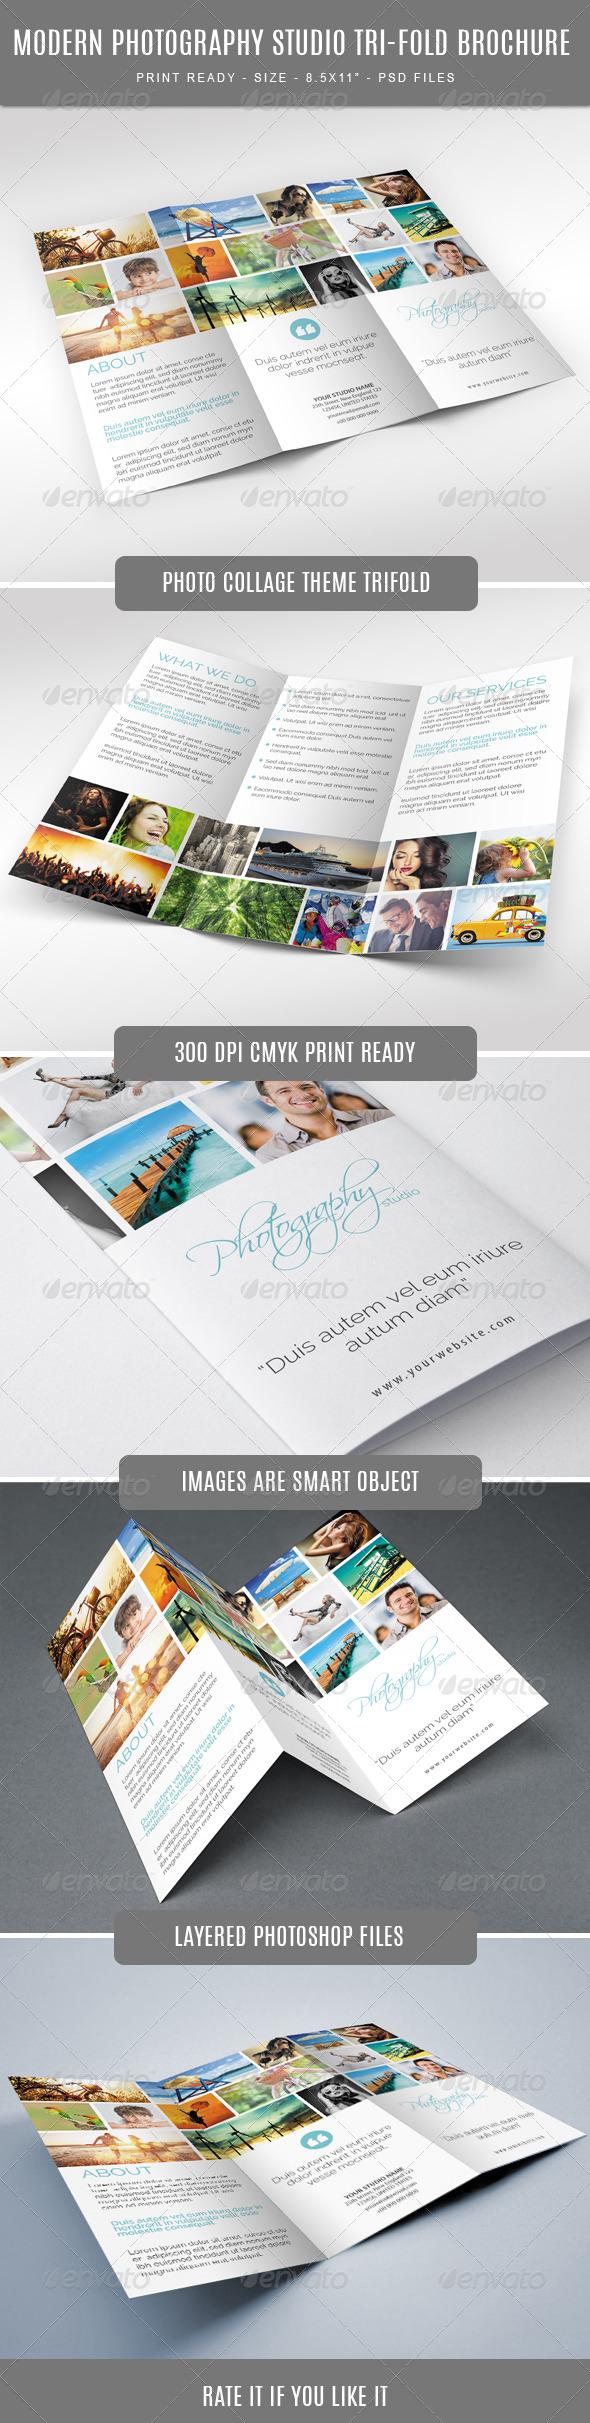 GraphicRiver Modern and Fashion Photography Studio Tri-Fold Bro 7857773